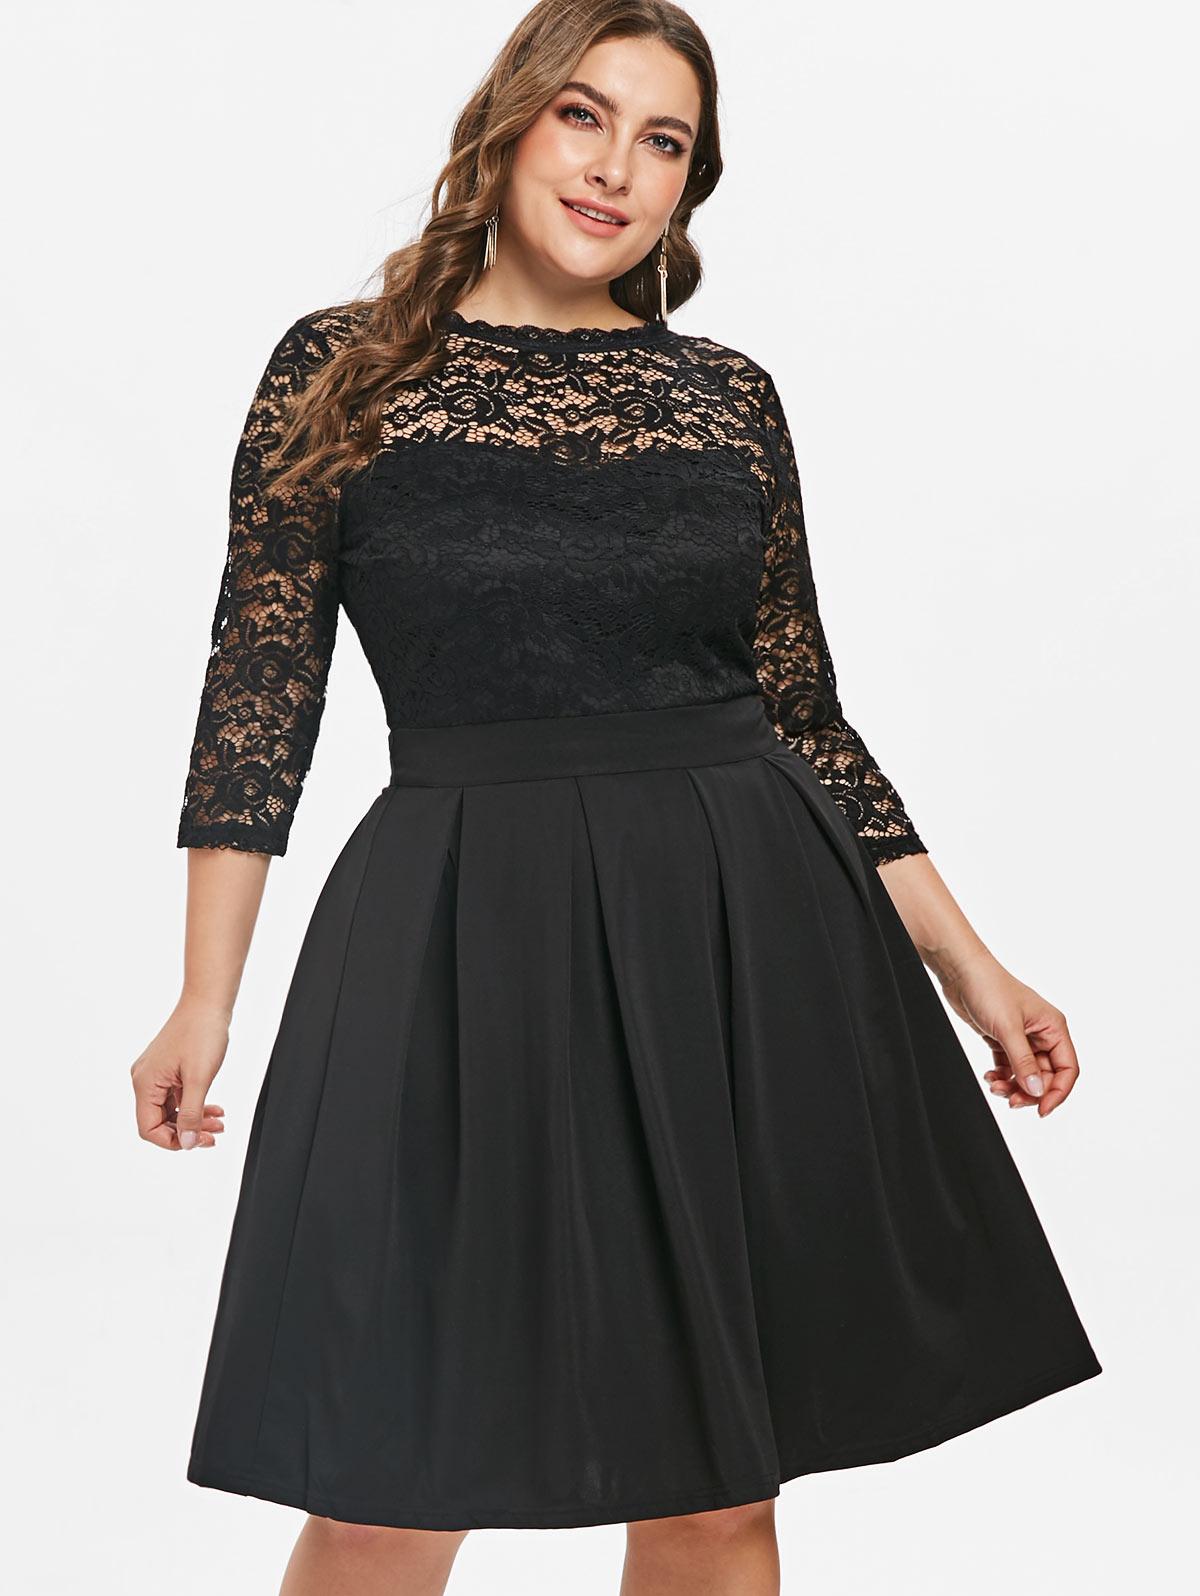 a3d97d82cc Wipalo Women Plus Size 5XL Round Neck Lace Panel A Line Dress Knee-Length  Solid Female Party Dress OL Dress Casual Vestidos